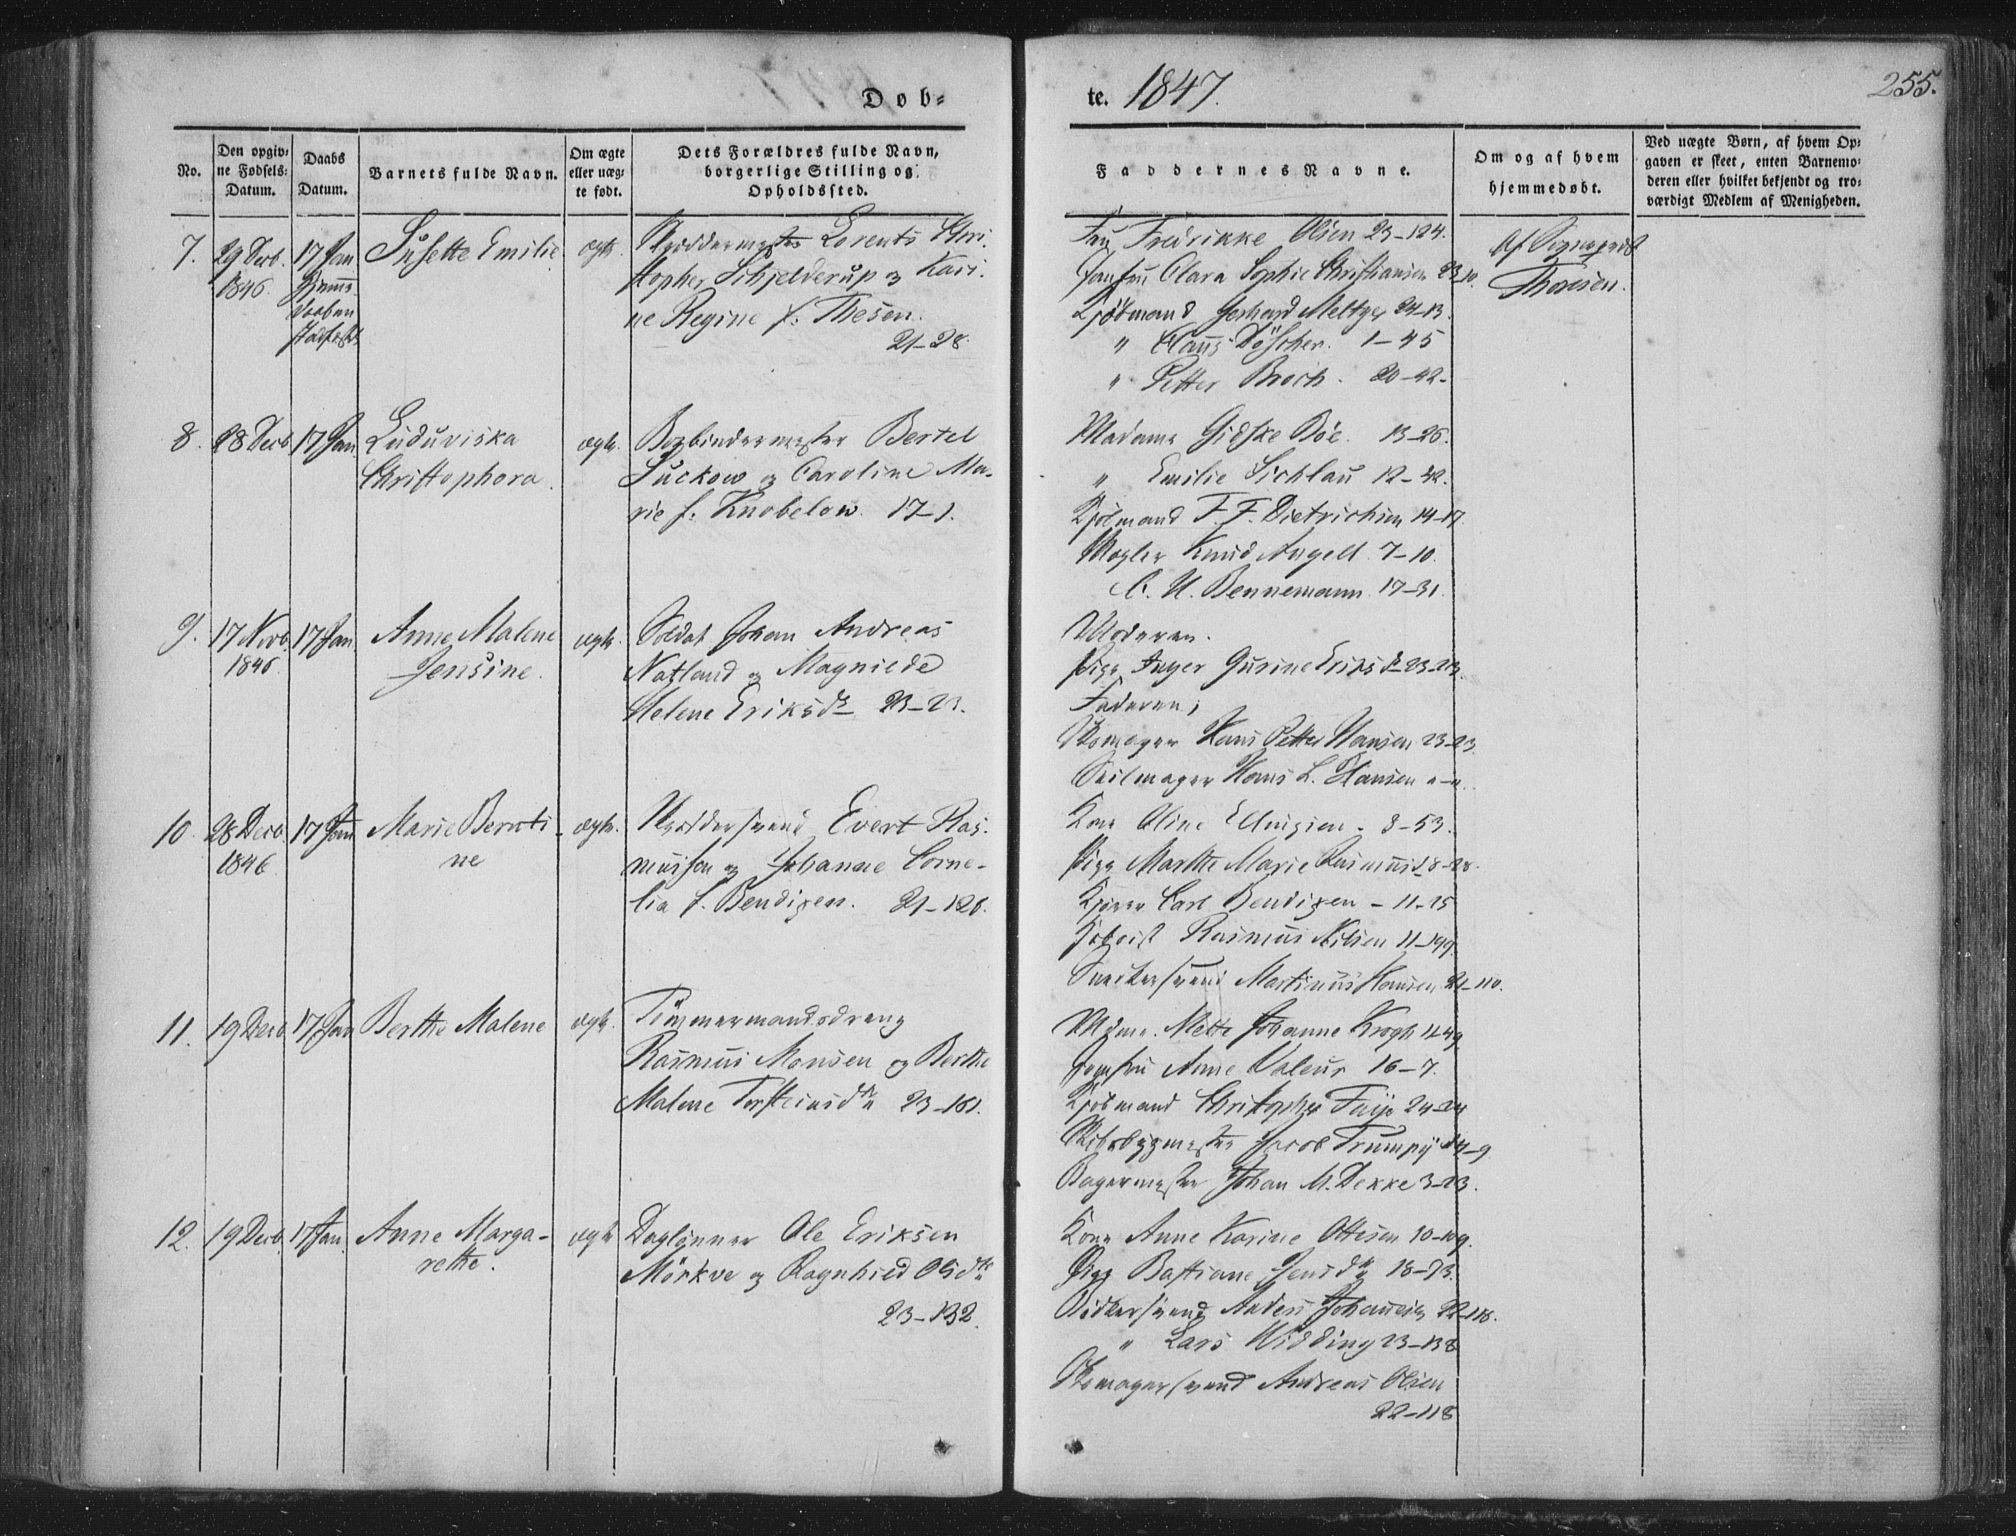 SAB, Korskirken Sokneprestembete, H/Haa/L0016: Ministerialbok nr. B 2, 1841-1851, s. 255